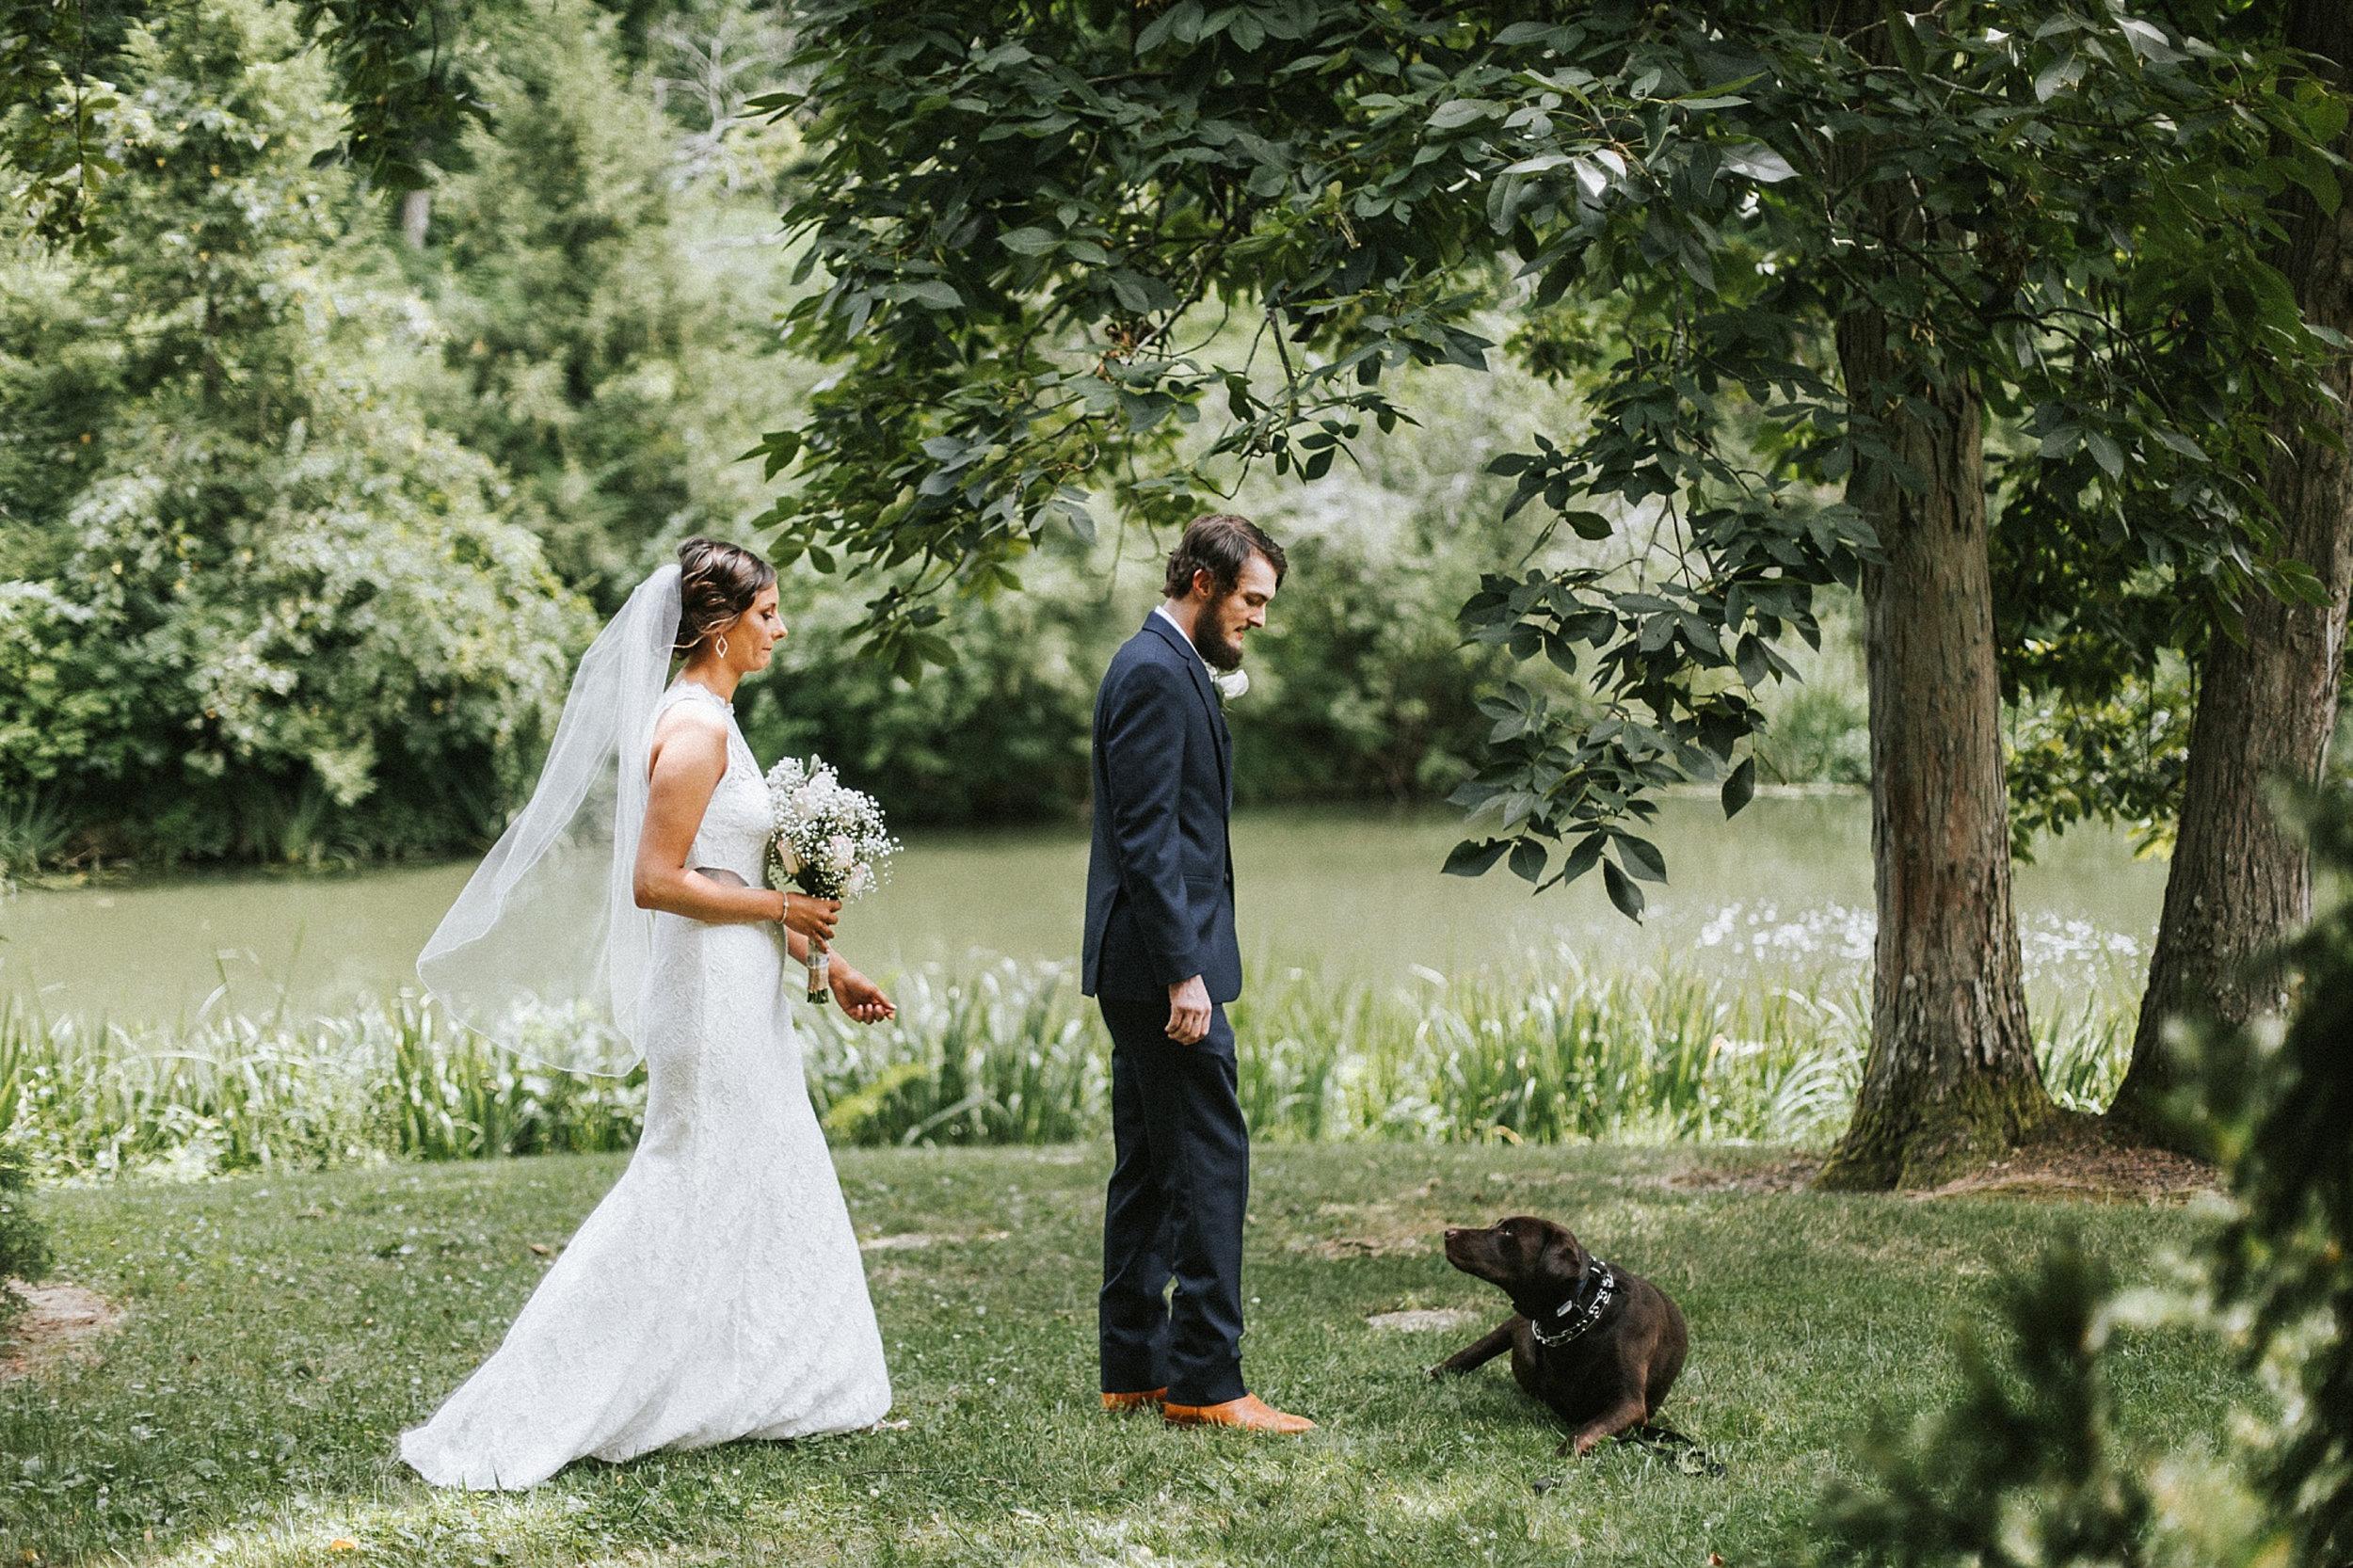 Brooke Townsend Photography - Ohio Wedding Photographer (6 of 78).jpg